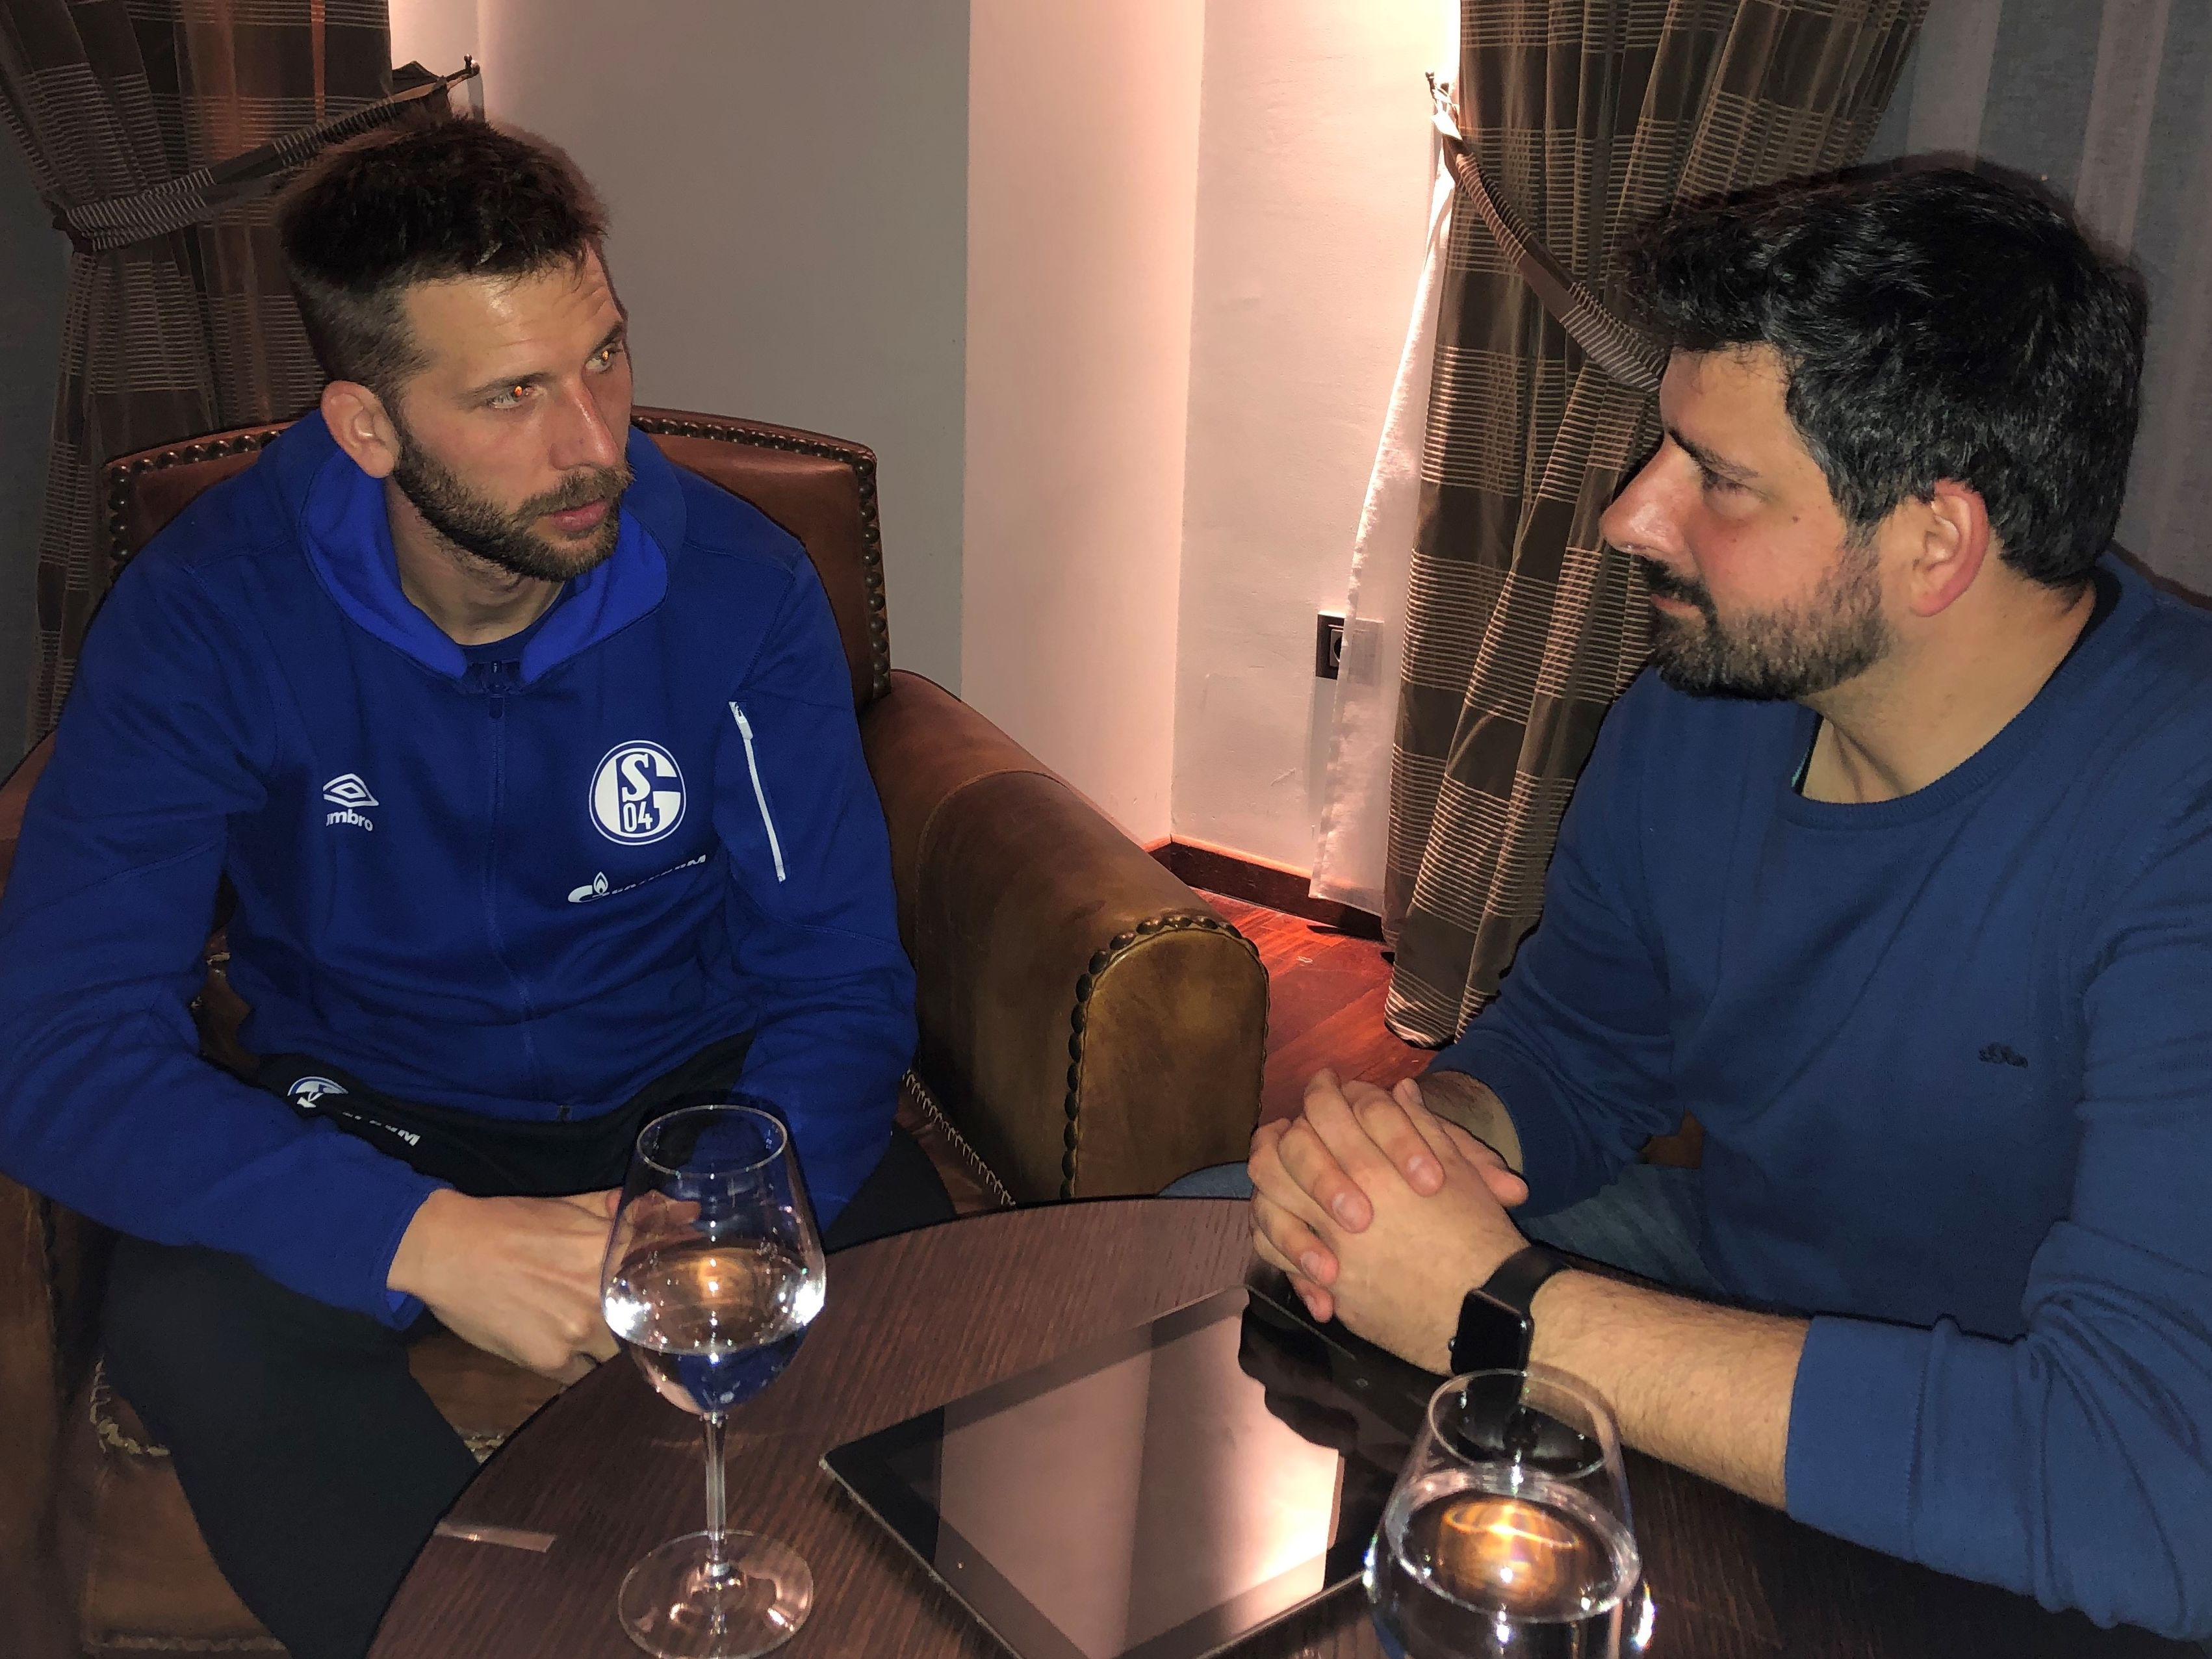 Guido Burgstaller und kicker-Reporter Toni Lieto